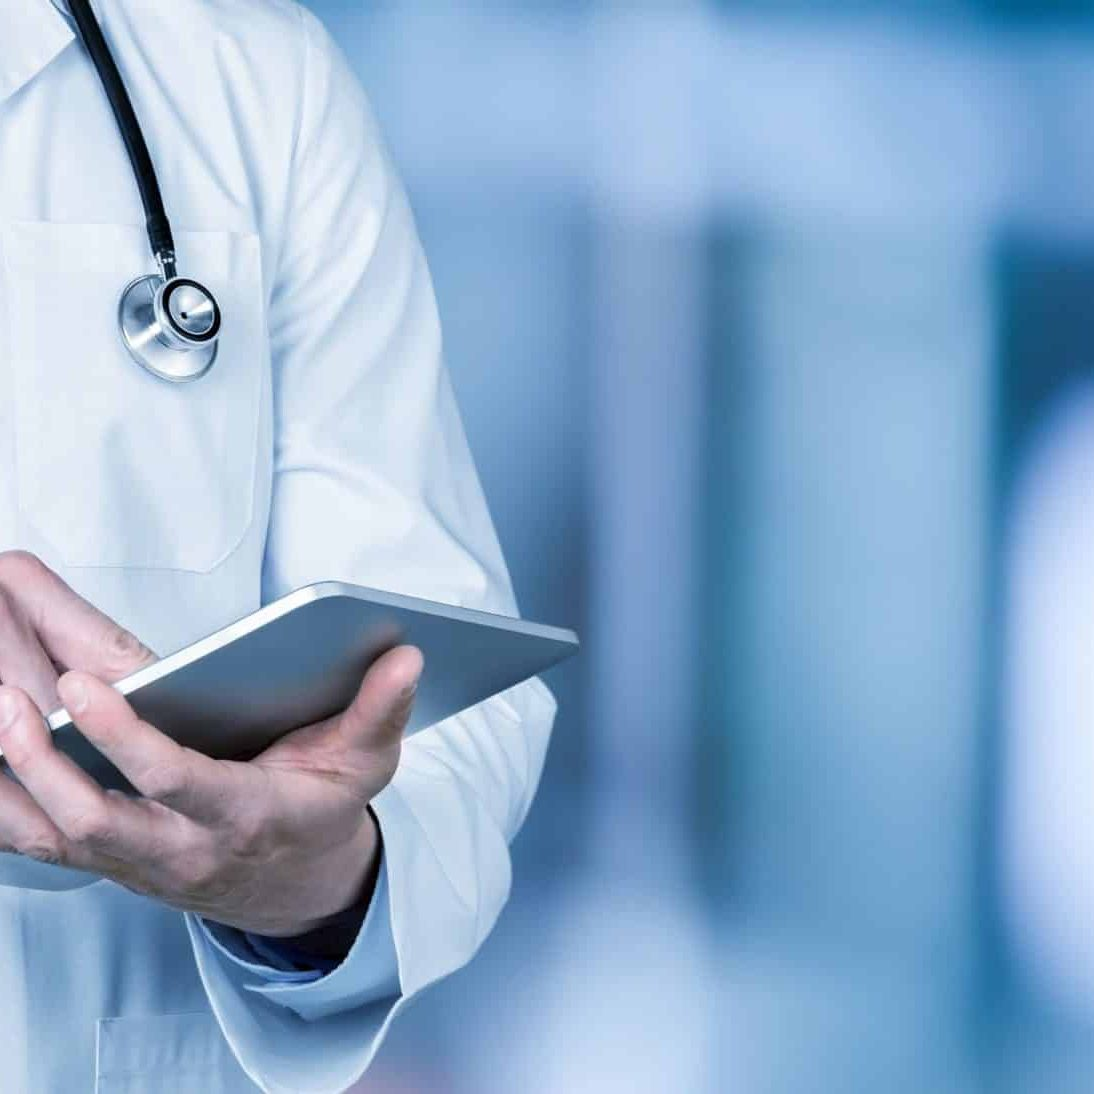 Seeking Medical Treatment After Car Accident